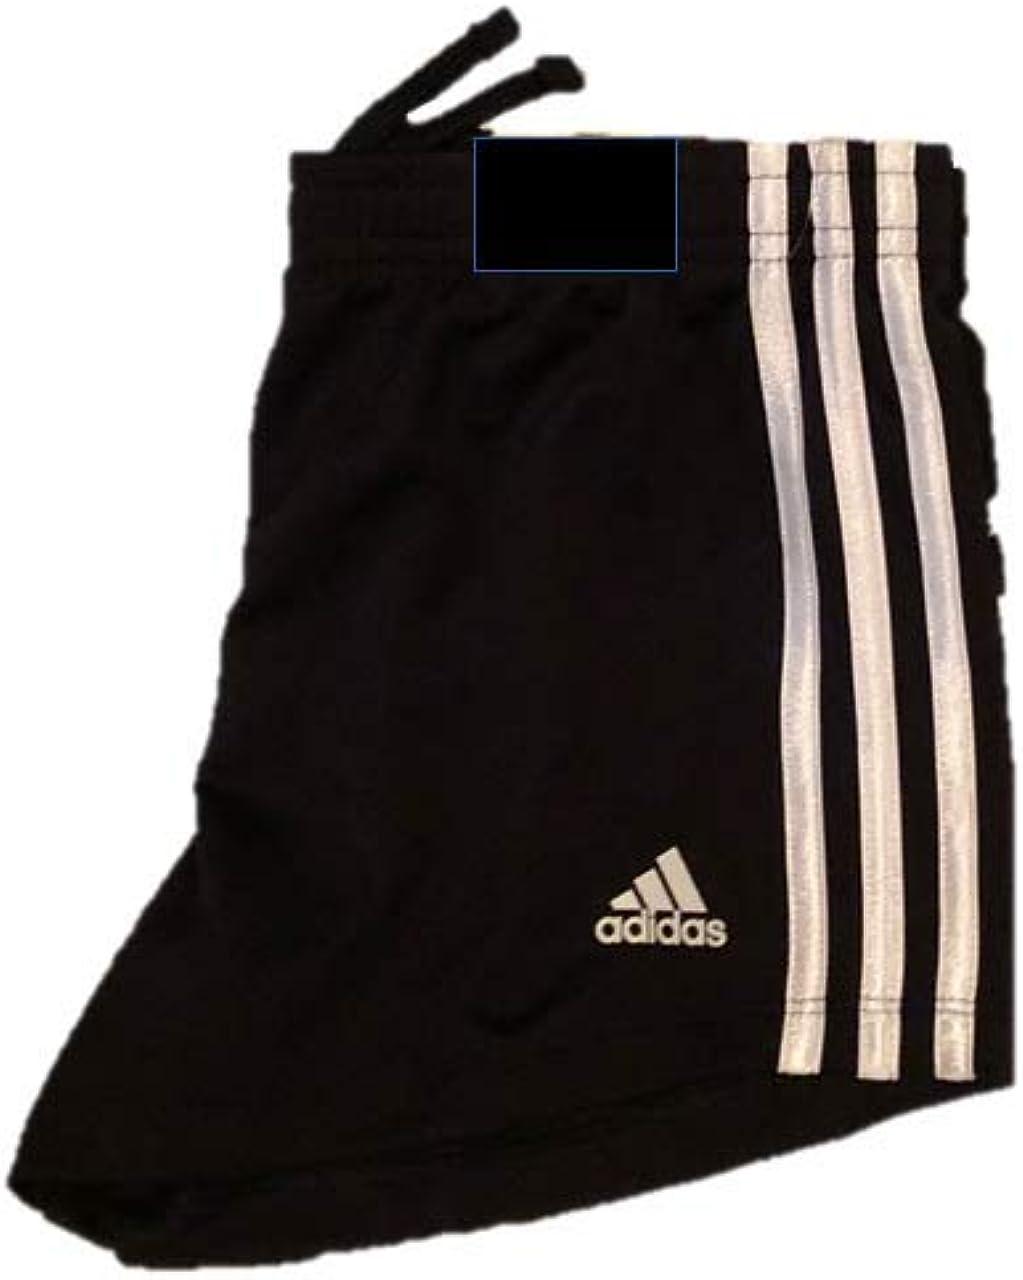 adidas Girls Youth Core Athletic Short